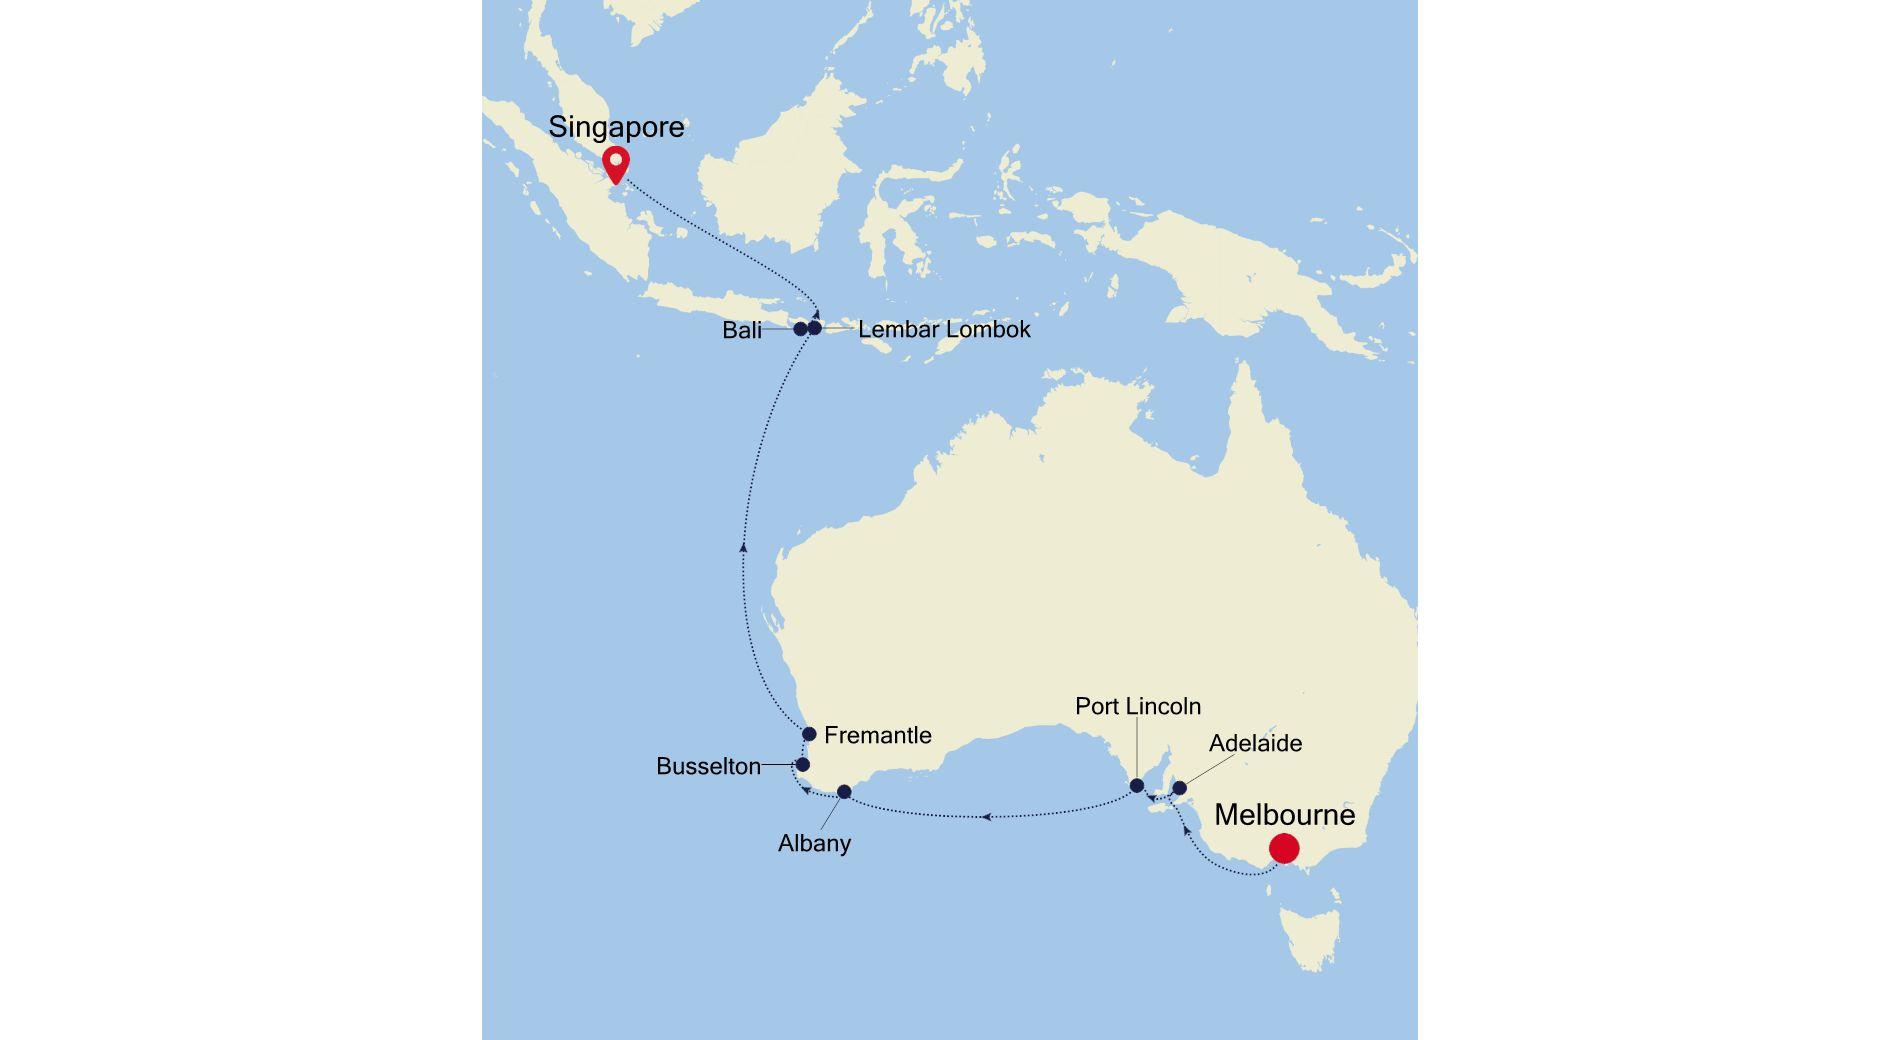 SM220221S16 - Melbourne à Singapore